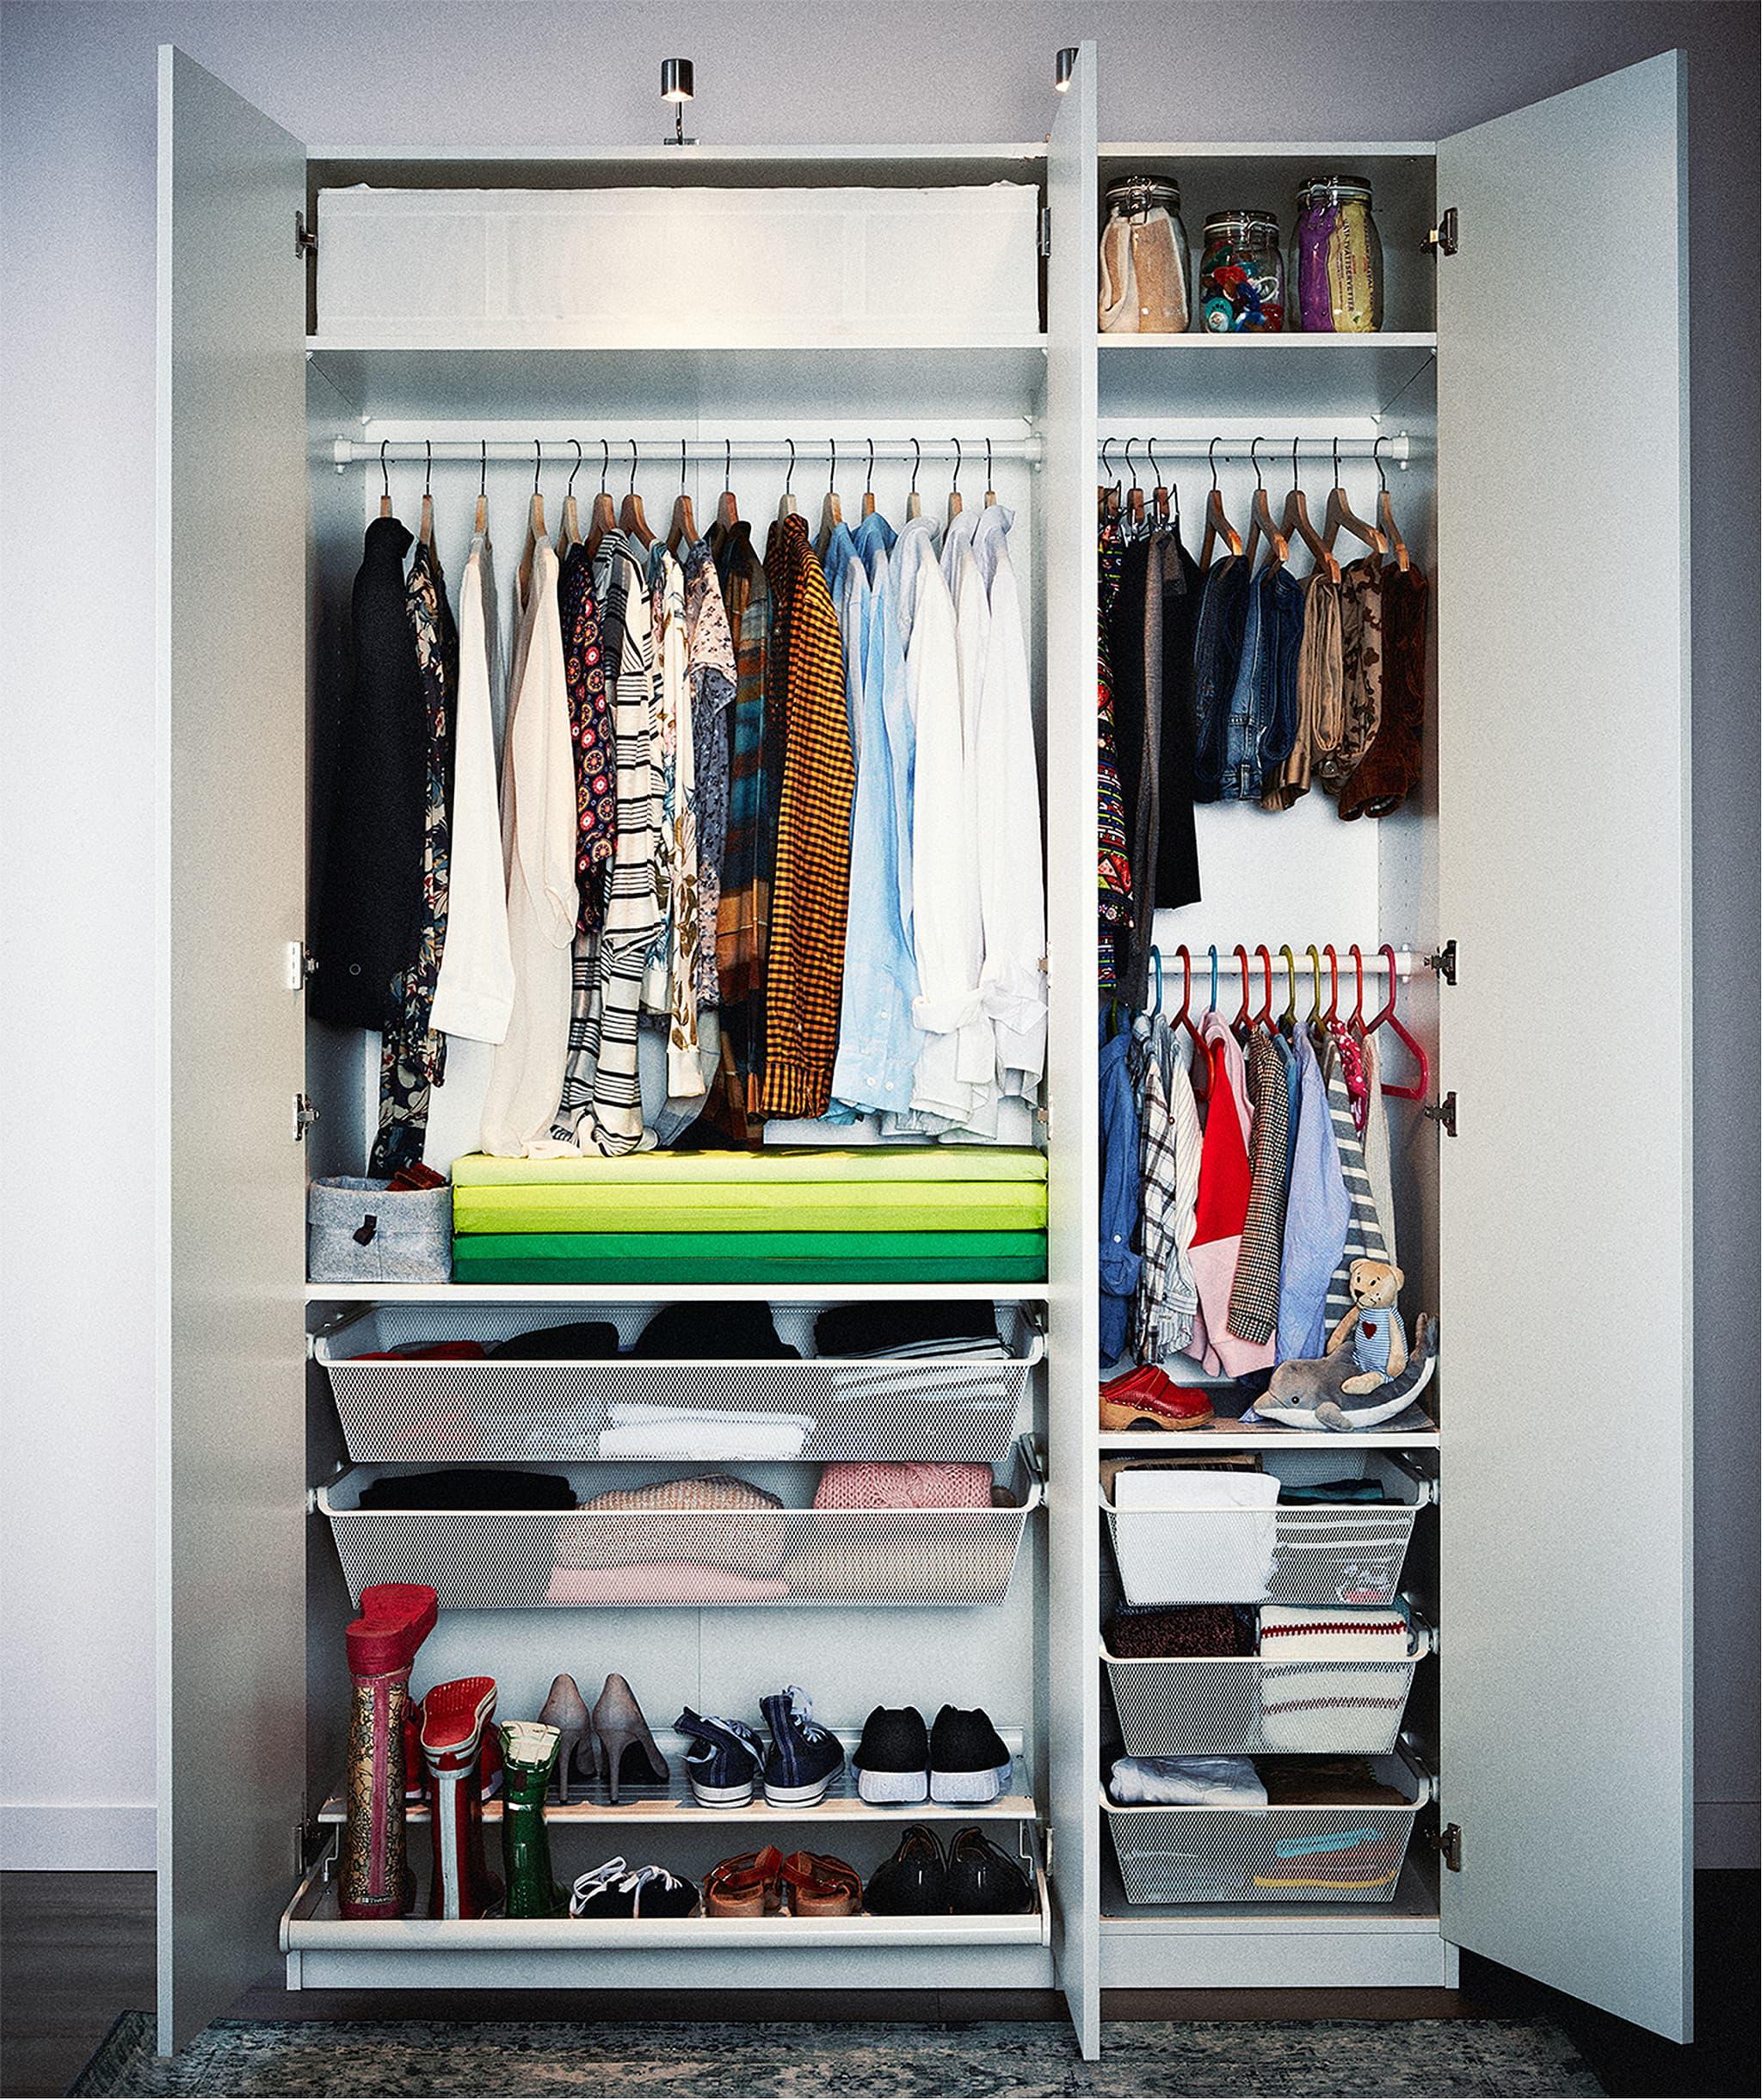 Gabungan lemari dua pintu dan satu pintu dengan koleksi pakaian yang sangat tertata pada gantungan dan rak, di laci dan kotak.